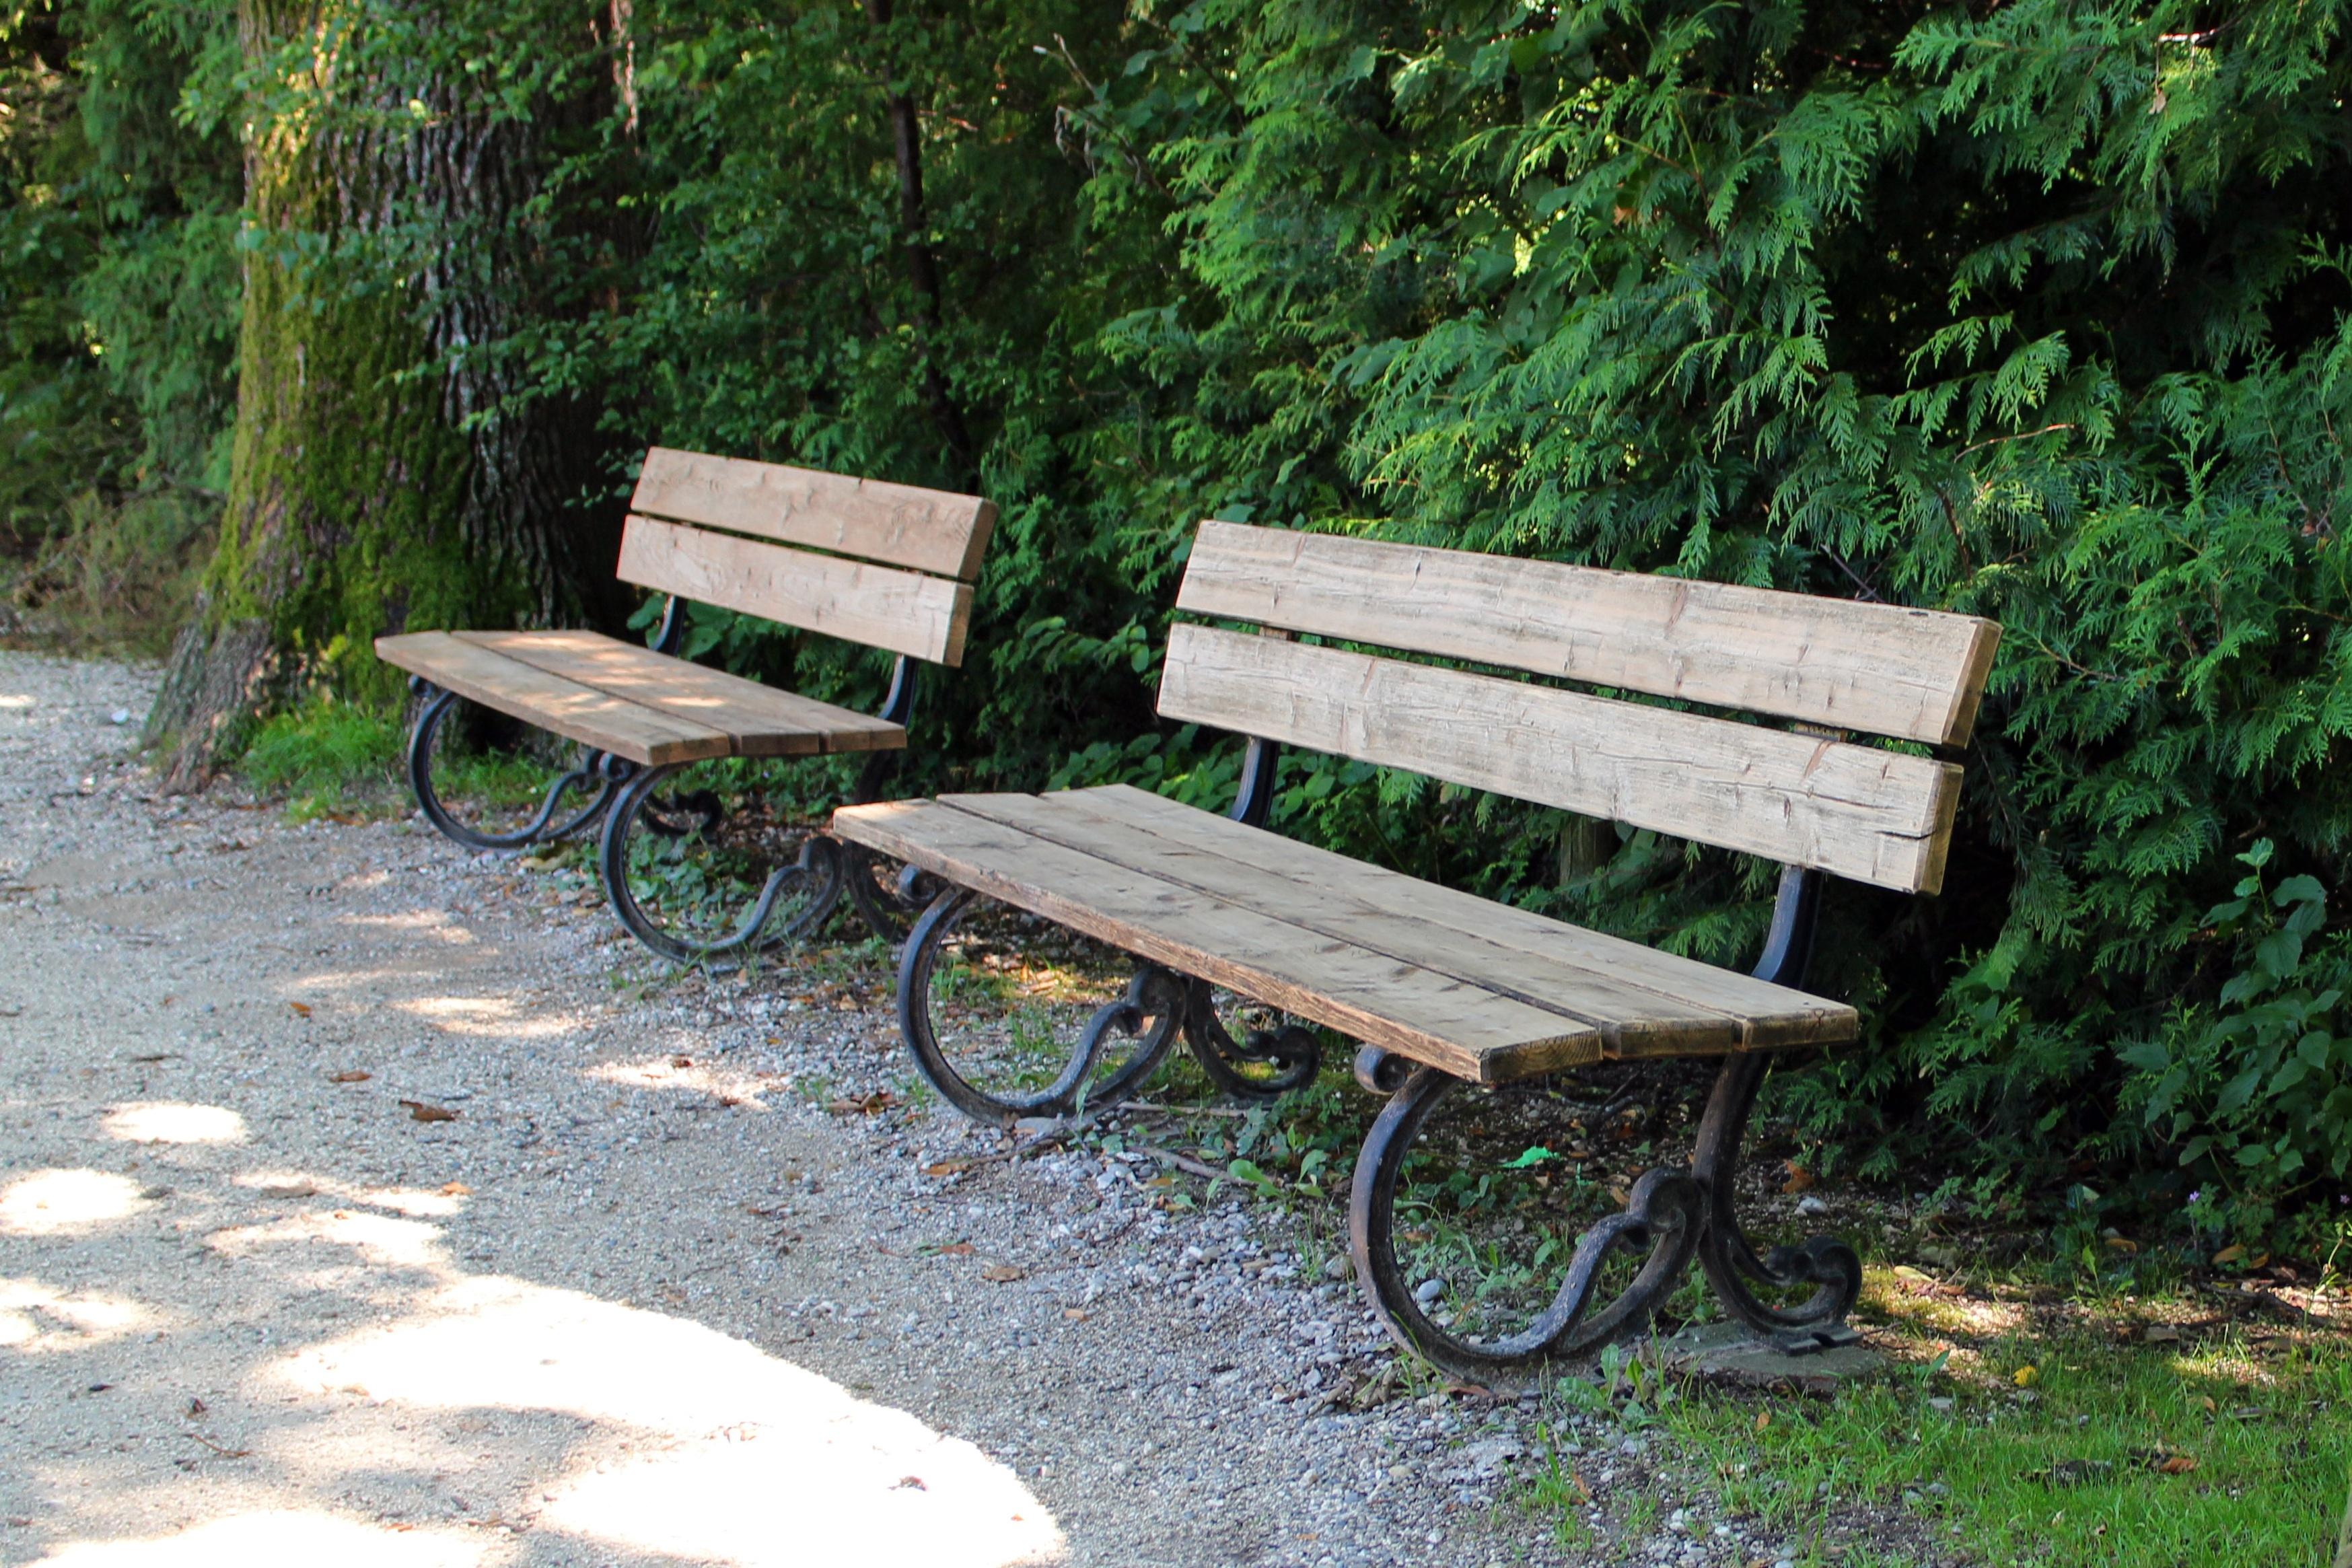 Free Images Nature Wood Bench Cart Seat Vehicle